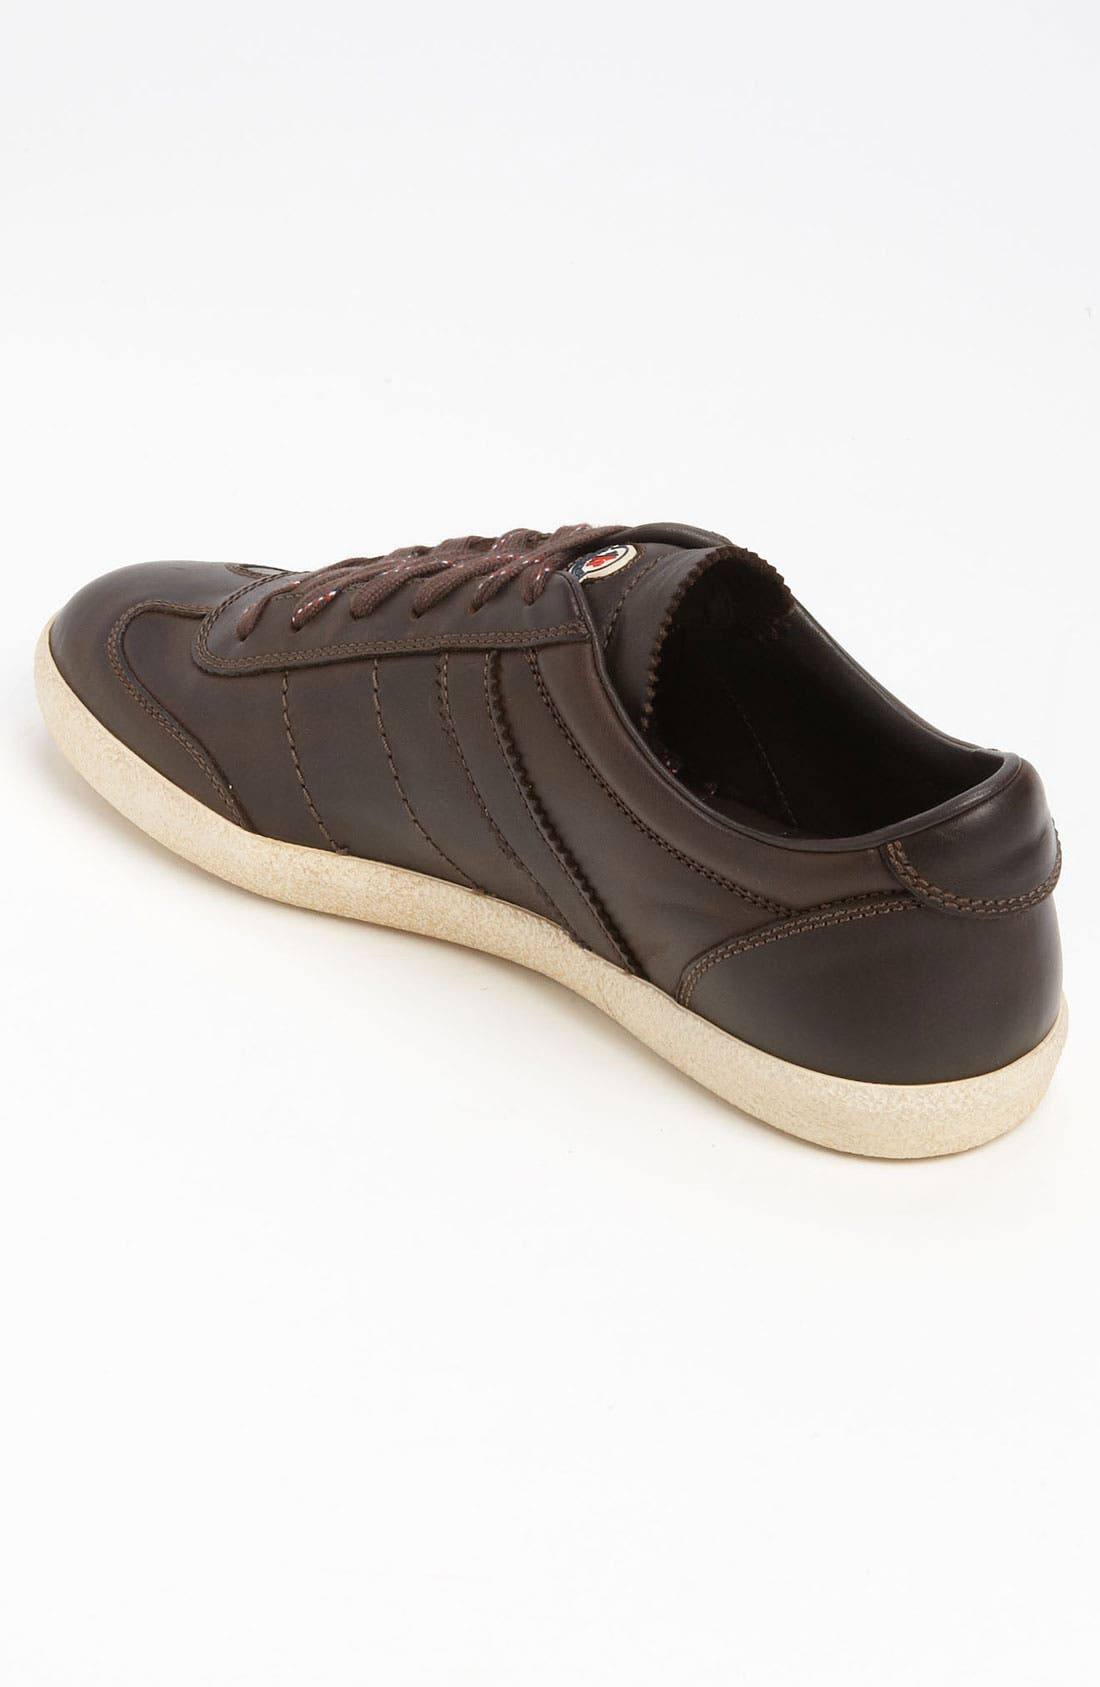 Alternate Image 2  - Moncler 'Biarritz' Sneaker